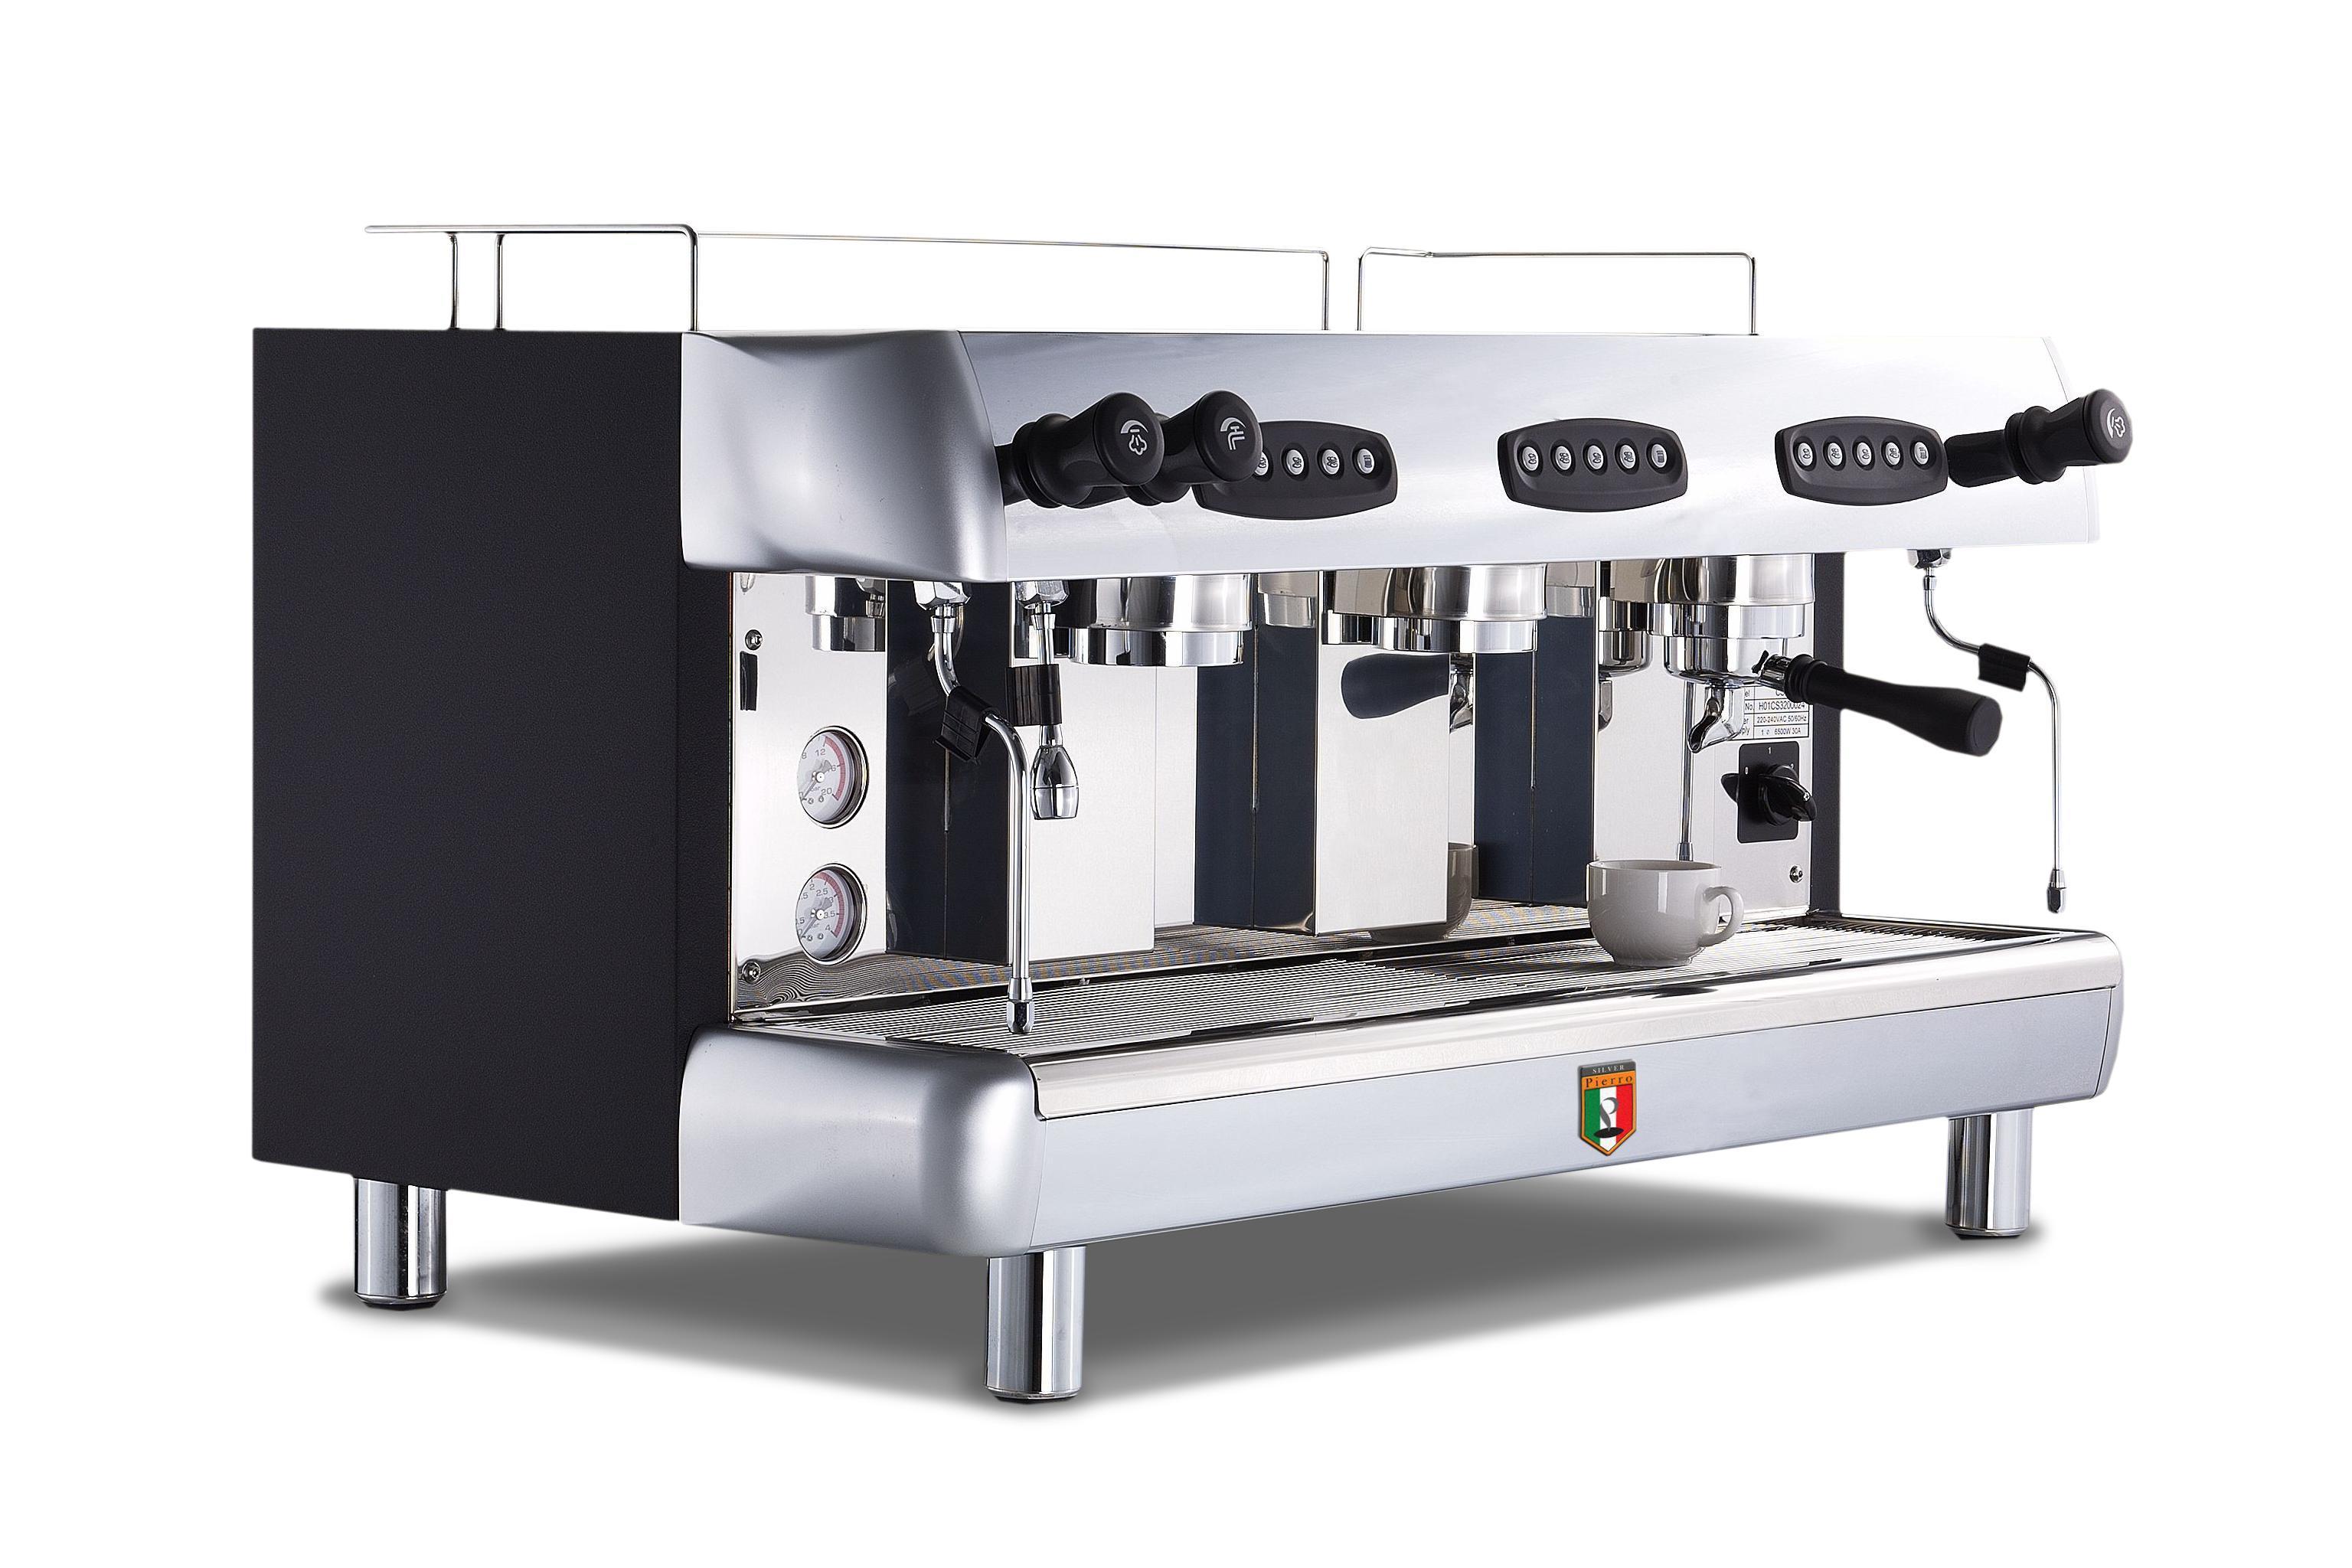 barista coffee machine. Black Bedroom Furniture Sets. Home Design Ideas